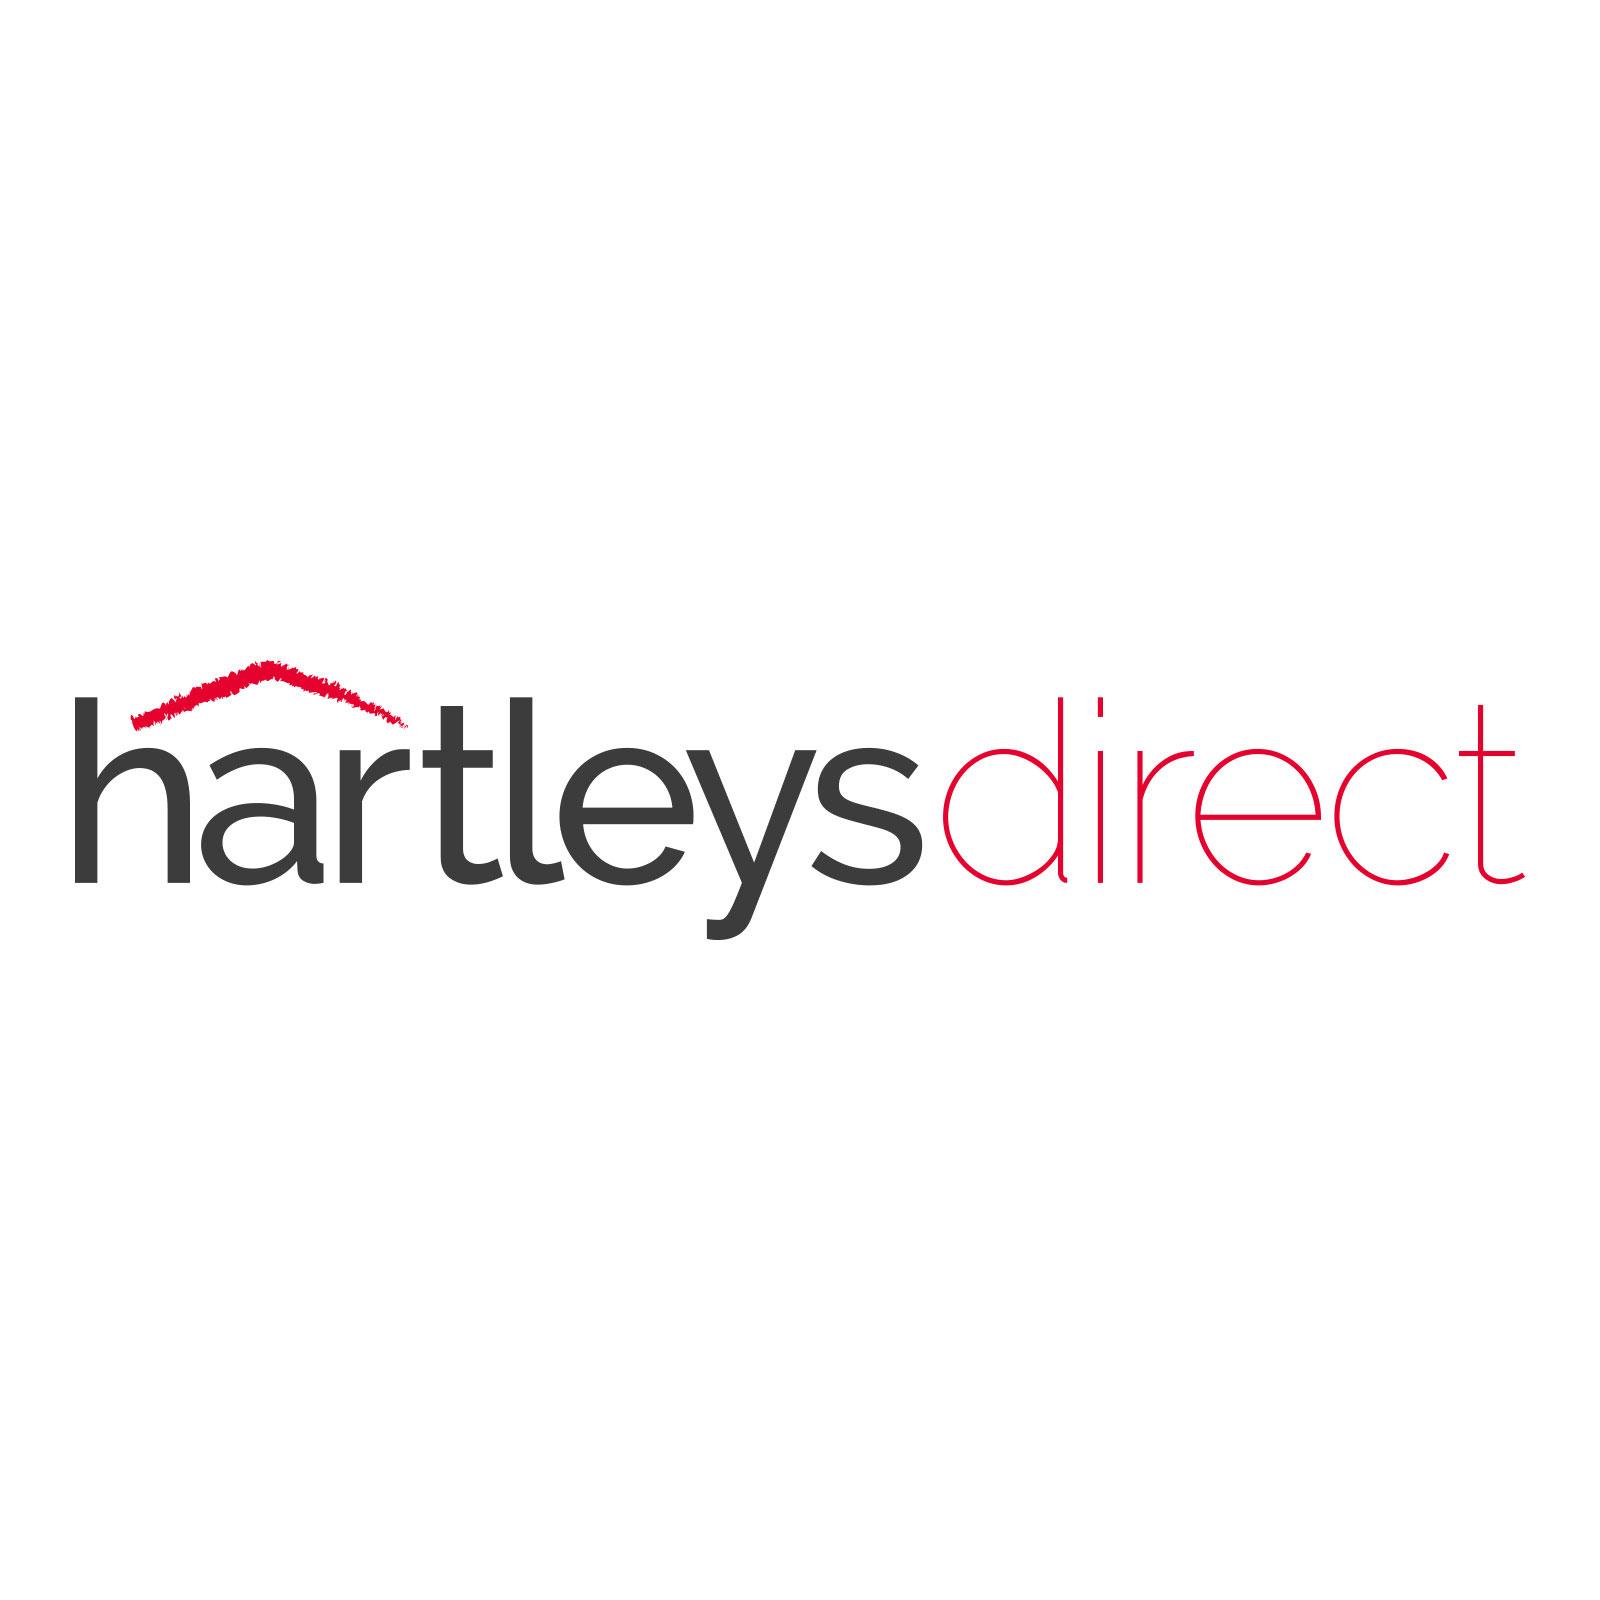 Grey-Hartleys-Fabric-Storage-Box-with-Handle-on-White-Background.jpg